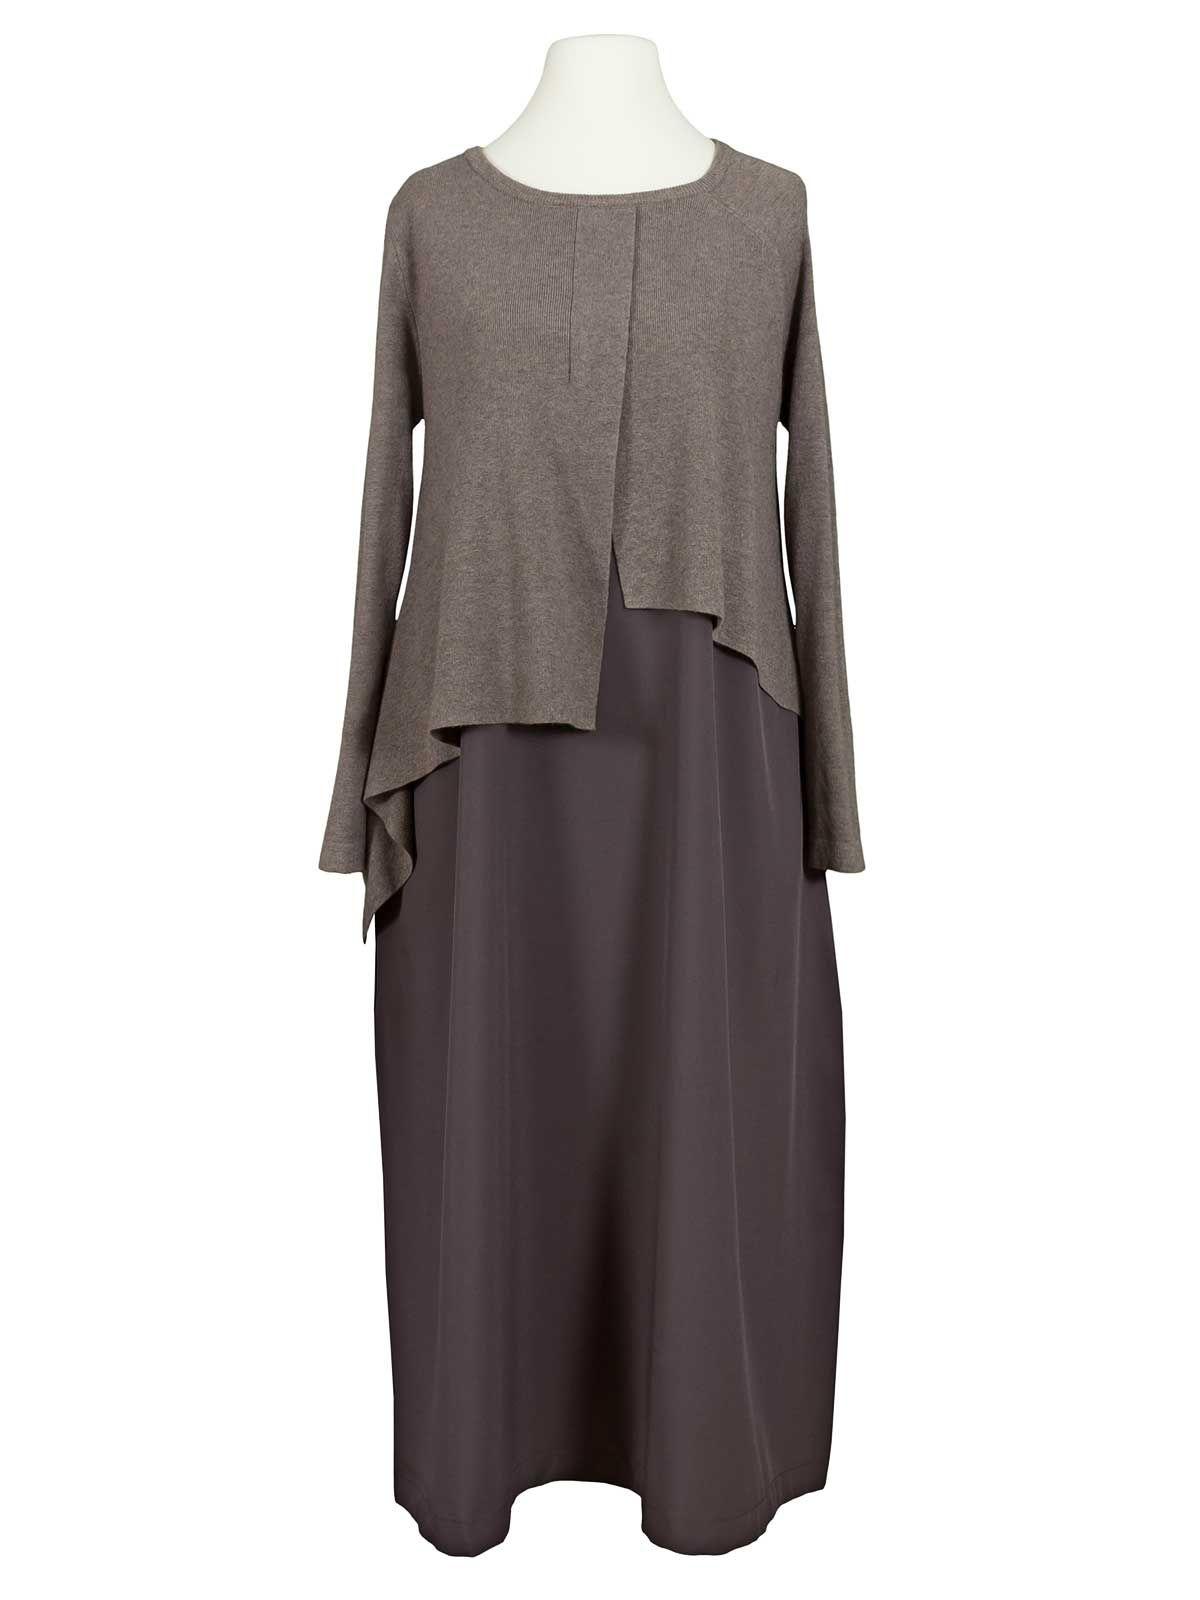 Kleid im Lagenlook, braun   Herbstmode Damen 2018   Pinterest ... 2eba91e5b2